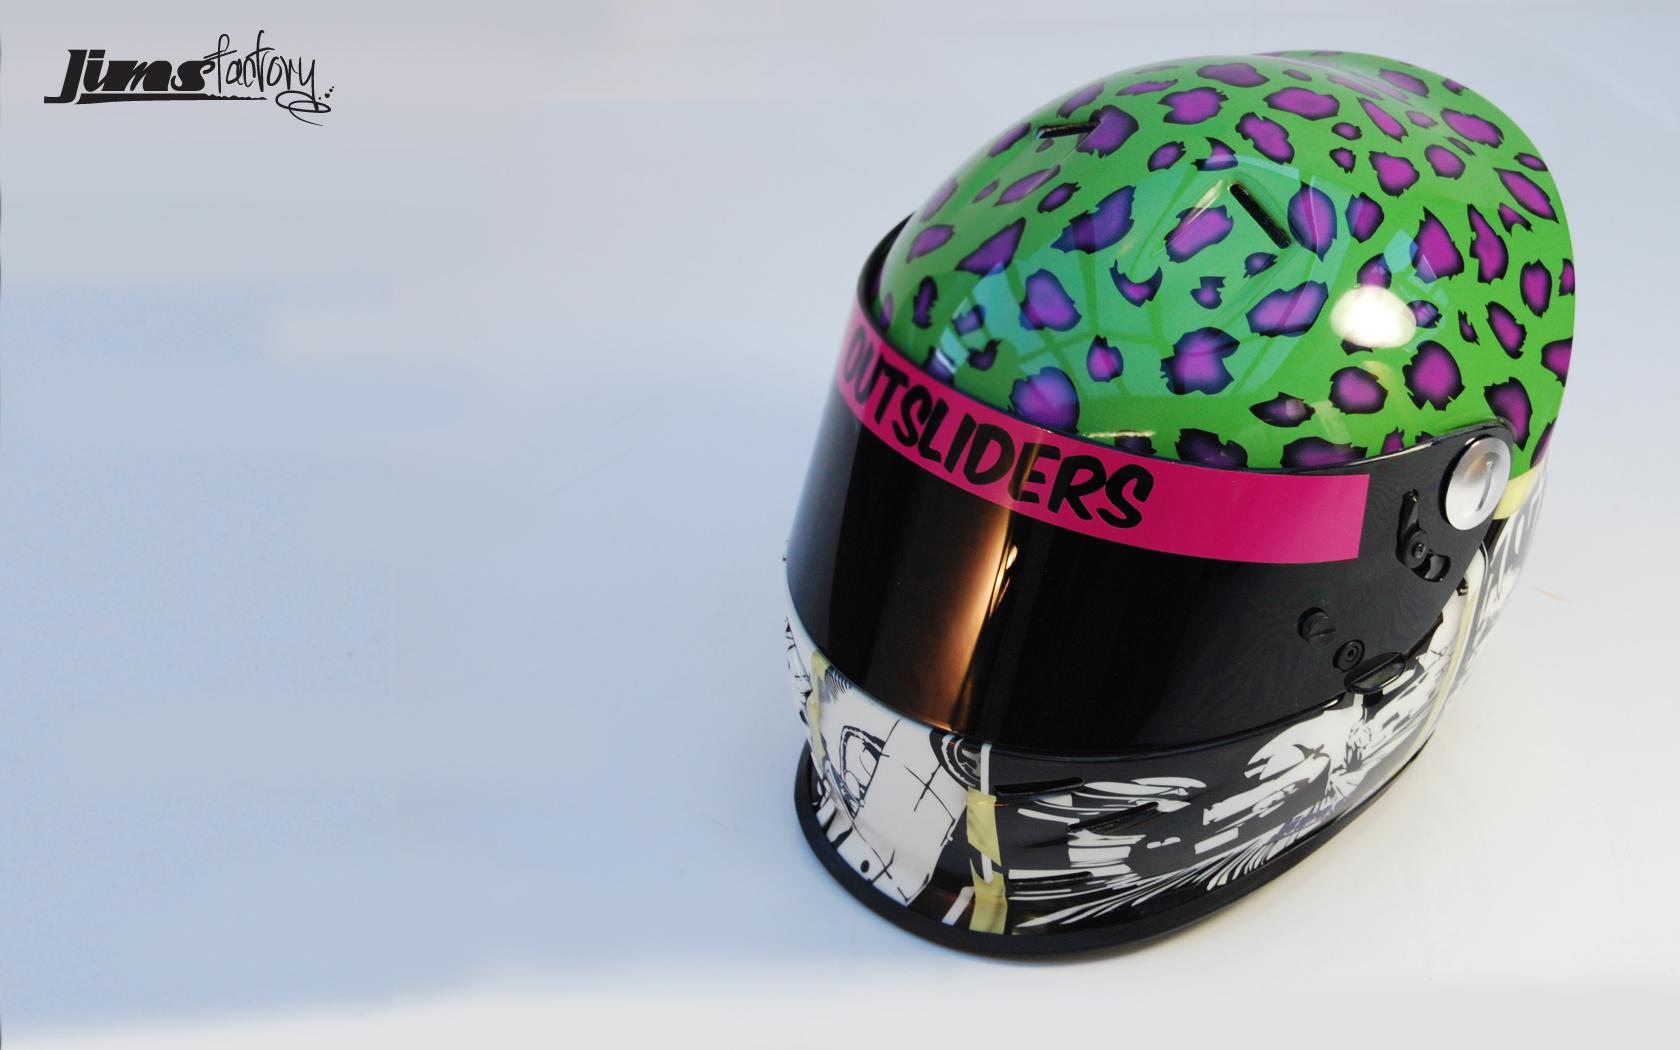 Jims Factory Painted Helmet Wallpaper